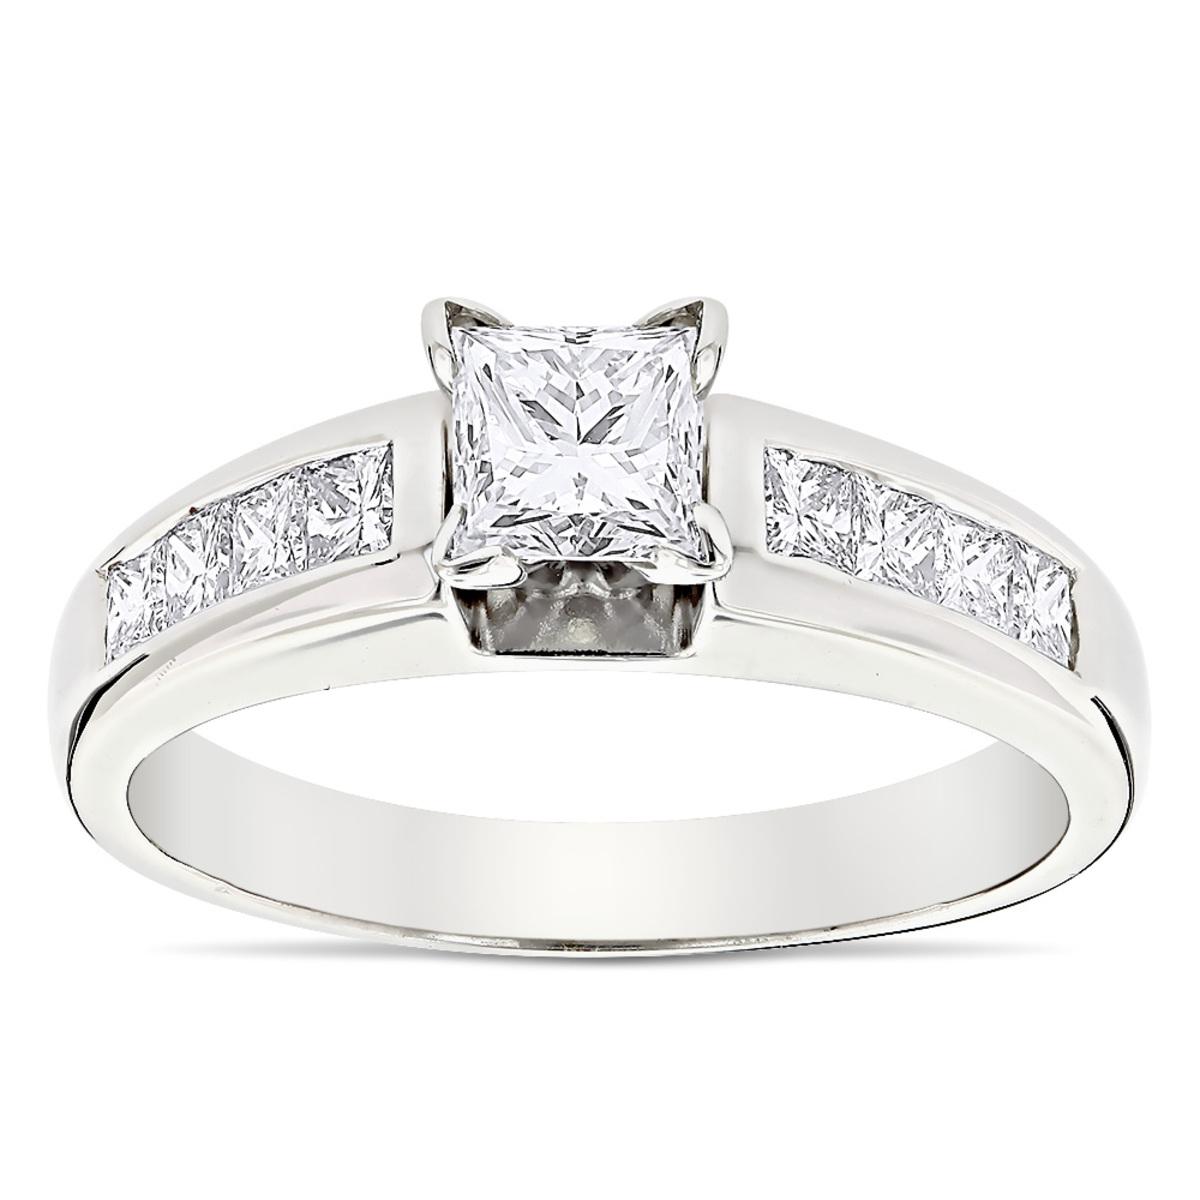 Princess Cut Diamond Engagement Ring 0.66ct 14K Gold